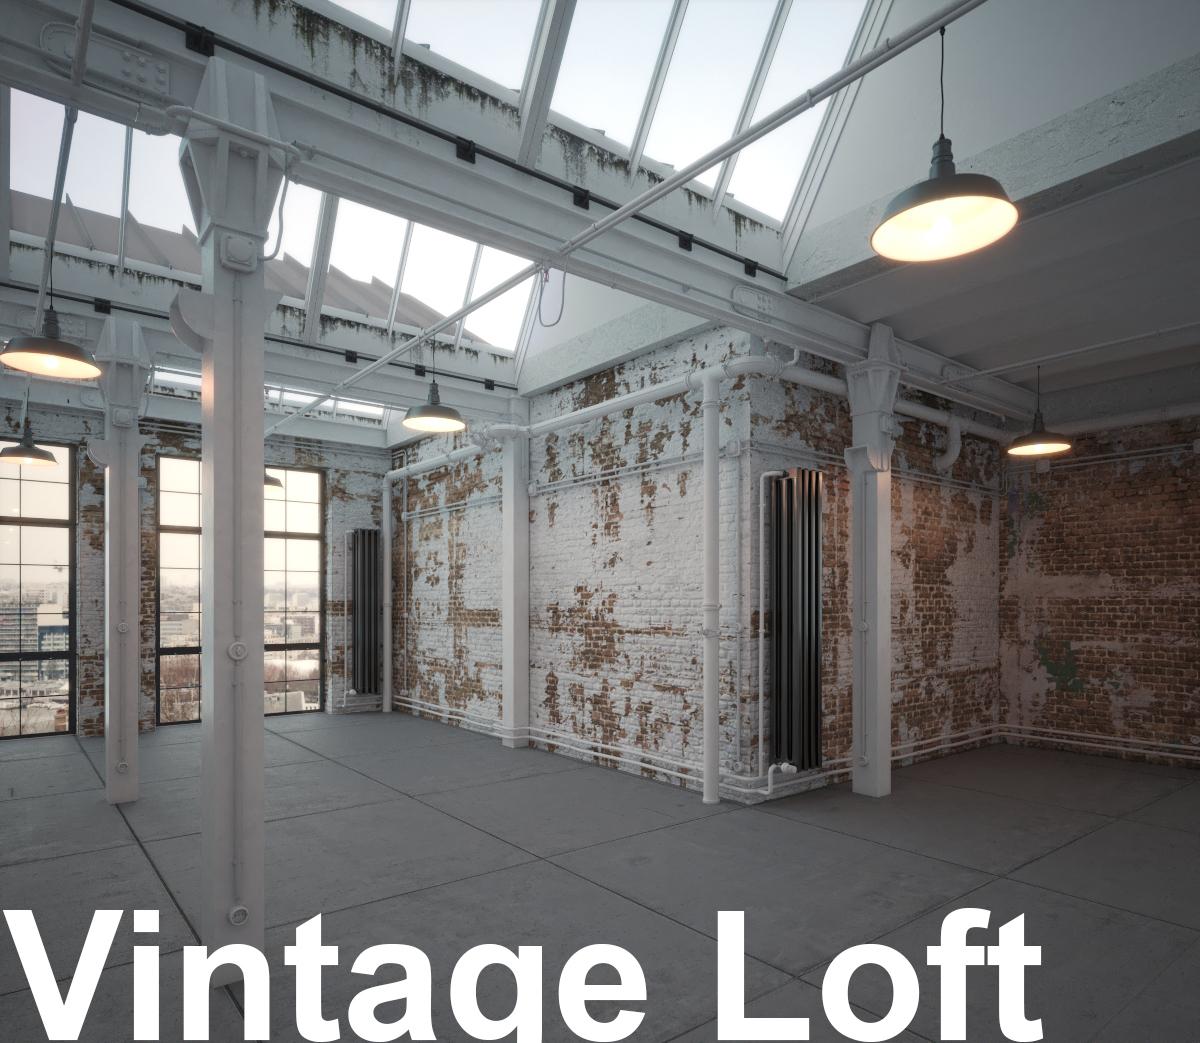 Old vintage industrial Loft Studio Apartment with brick walls